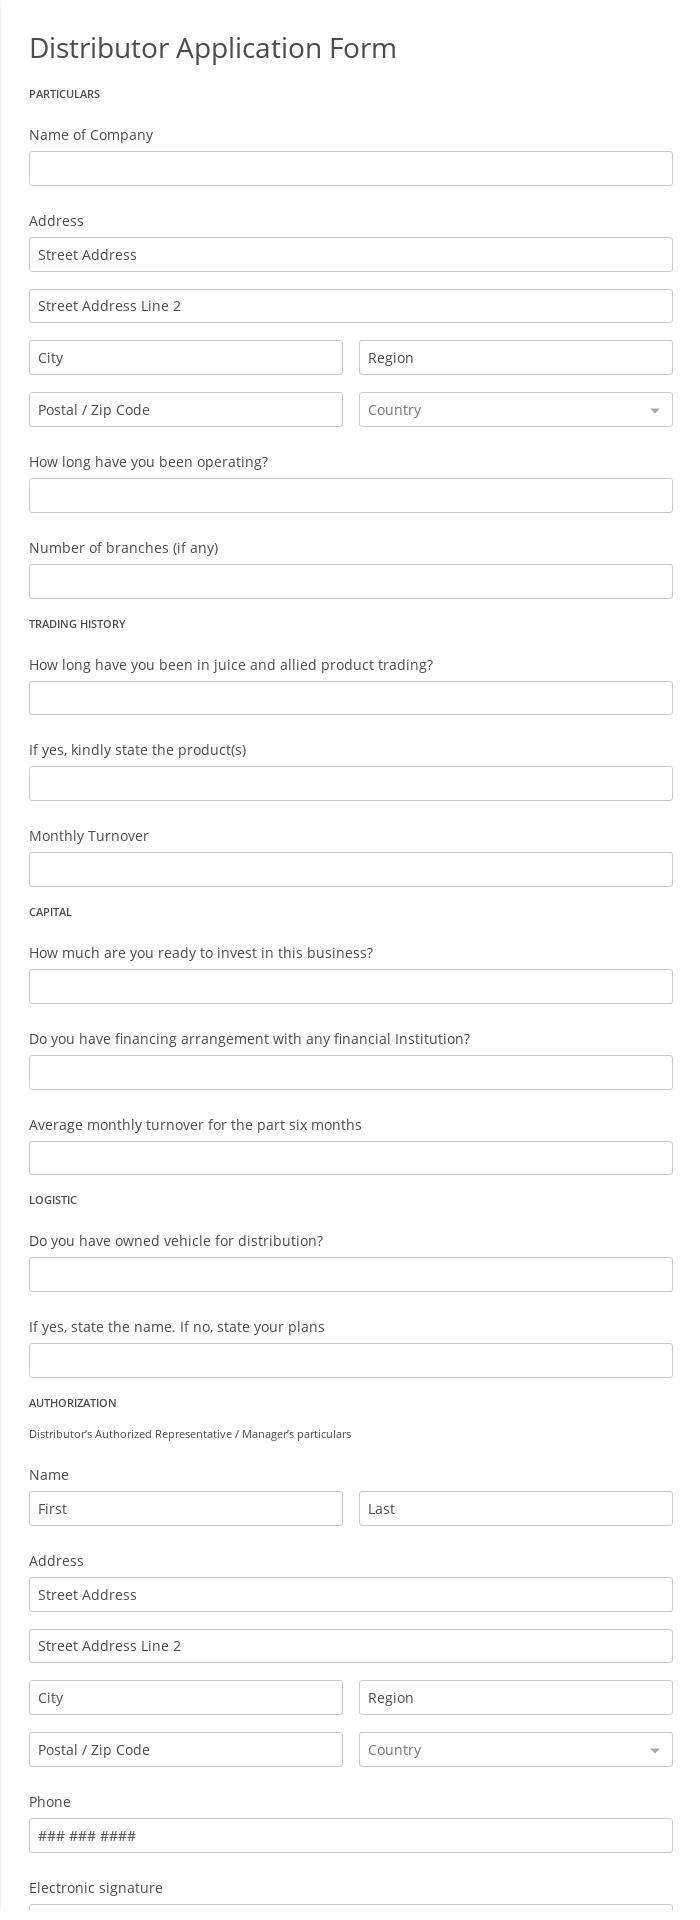 Distributor Application Form